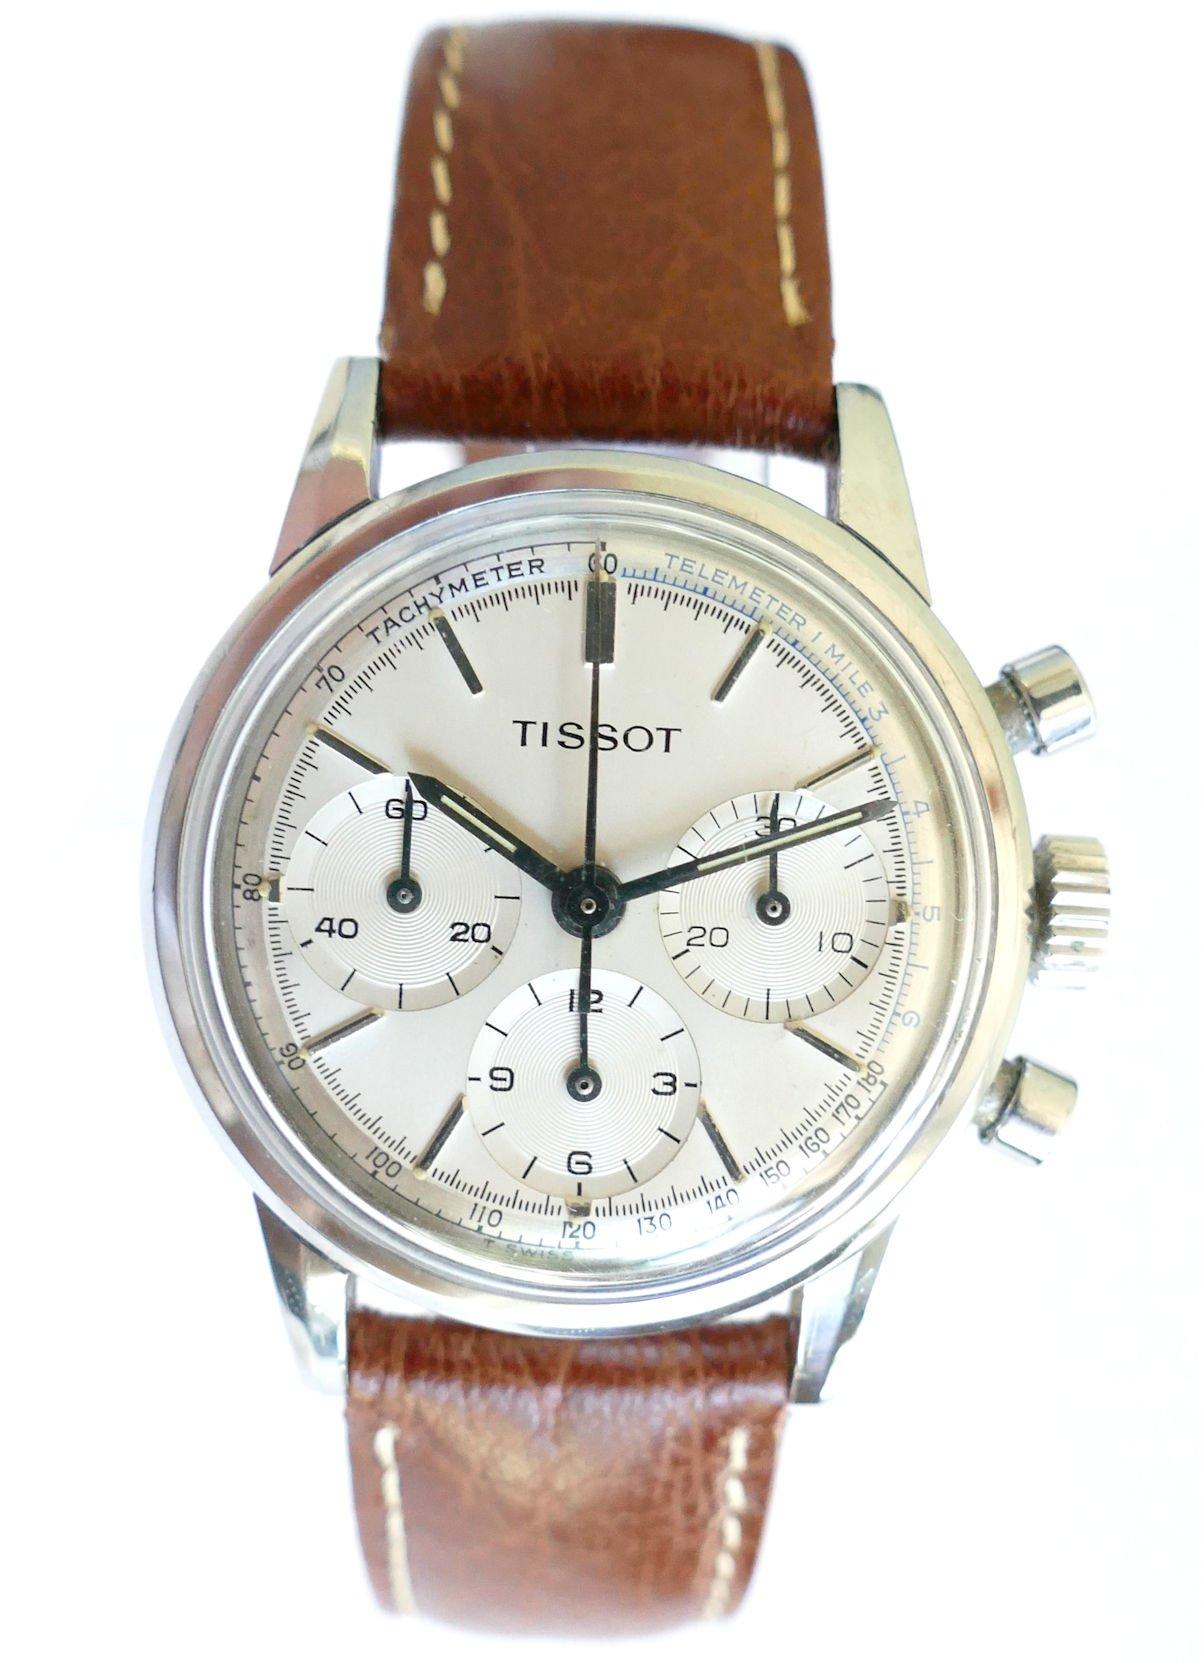 Tissot 808A 64 3205 Full Set Vintage Chronograph